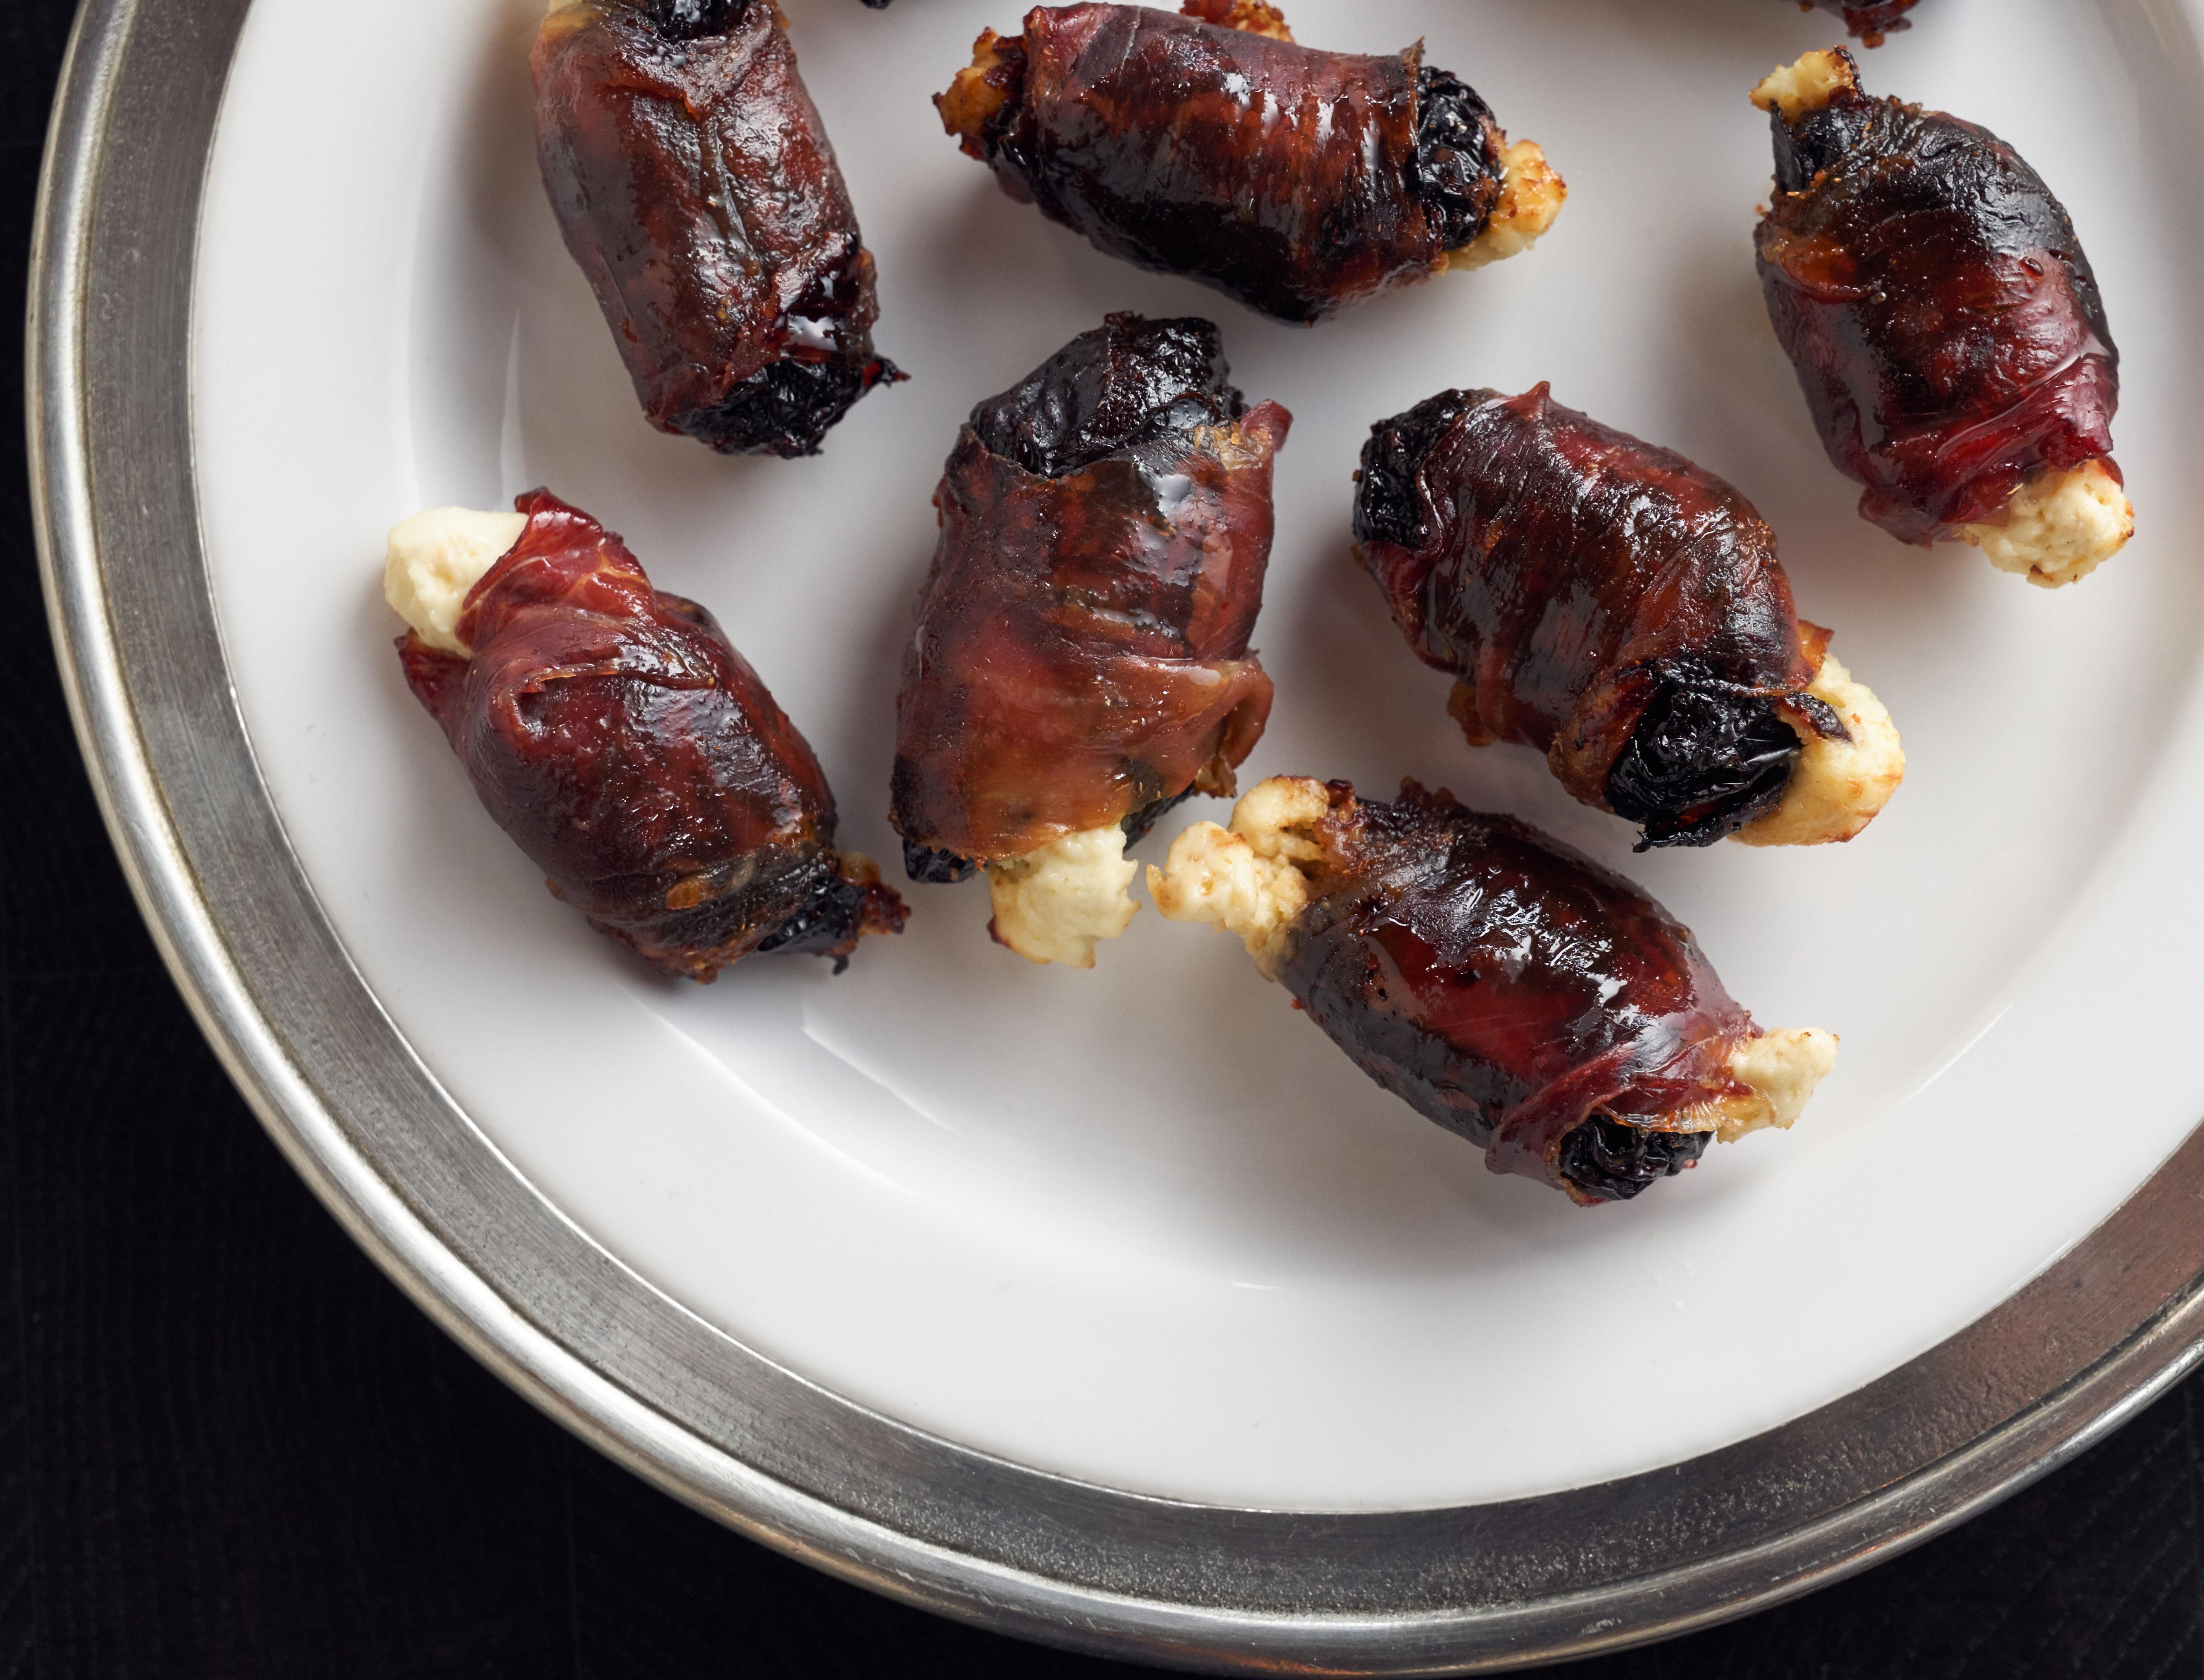 Diablos (Prosciutto Wrapped Prunes)